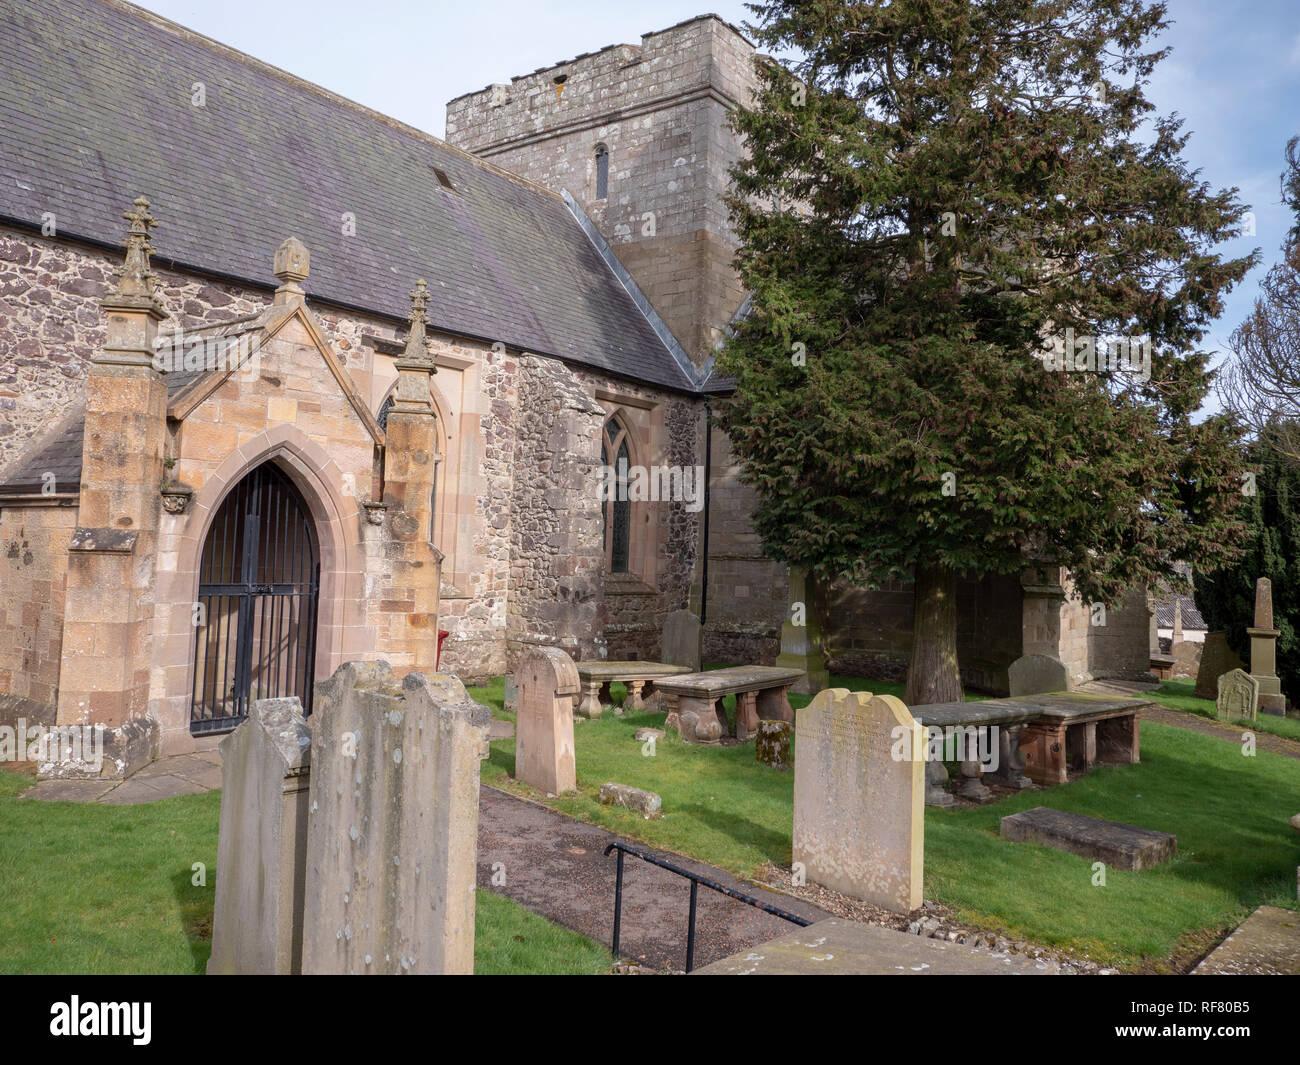 Biggar Kirk or Church of St Mary, Biggar, South Lanarkshire, Scotland, UK. - Stock Image